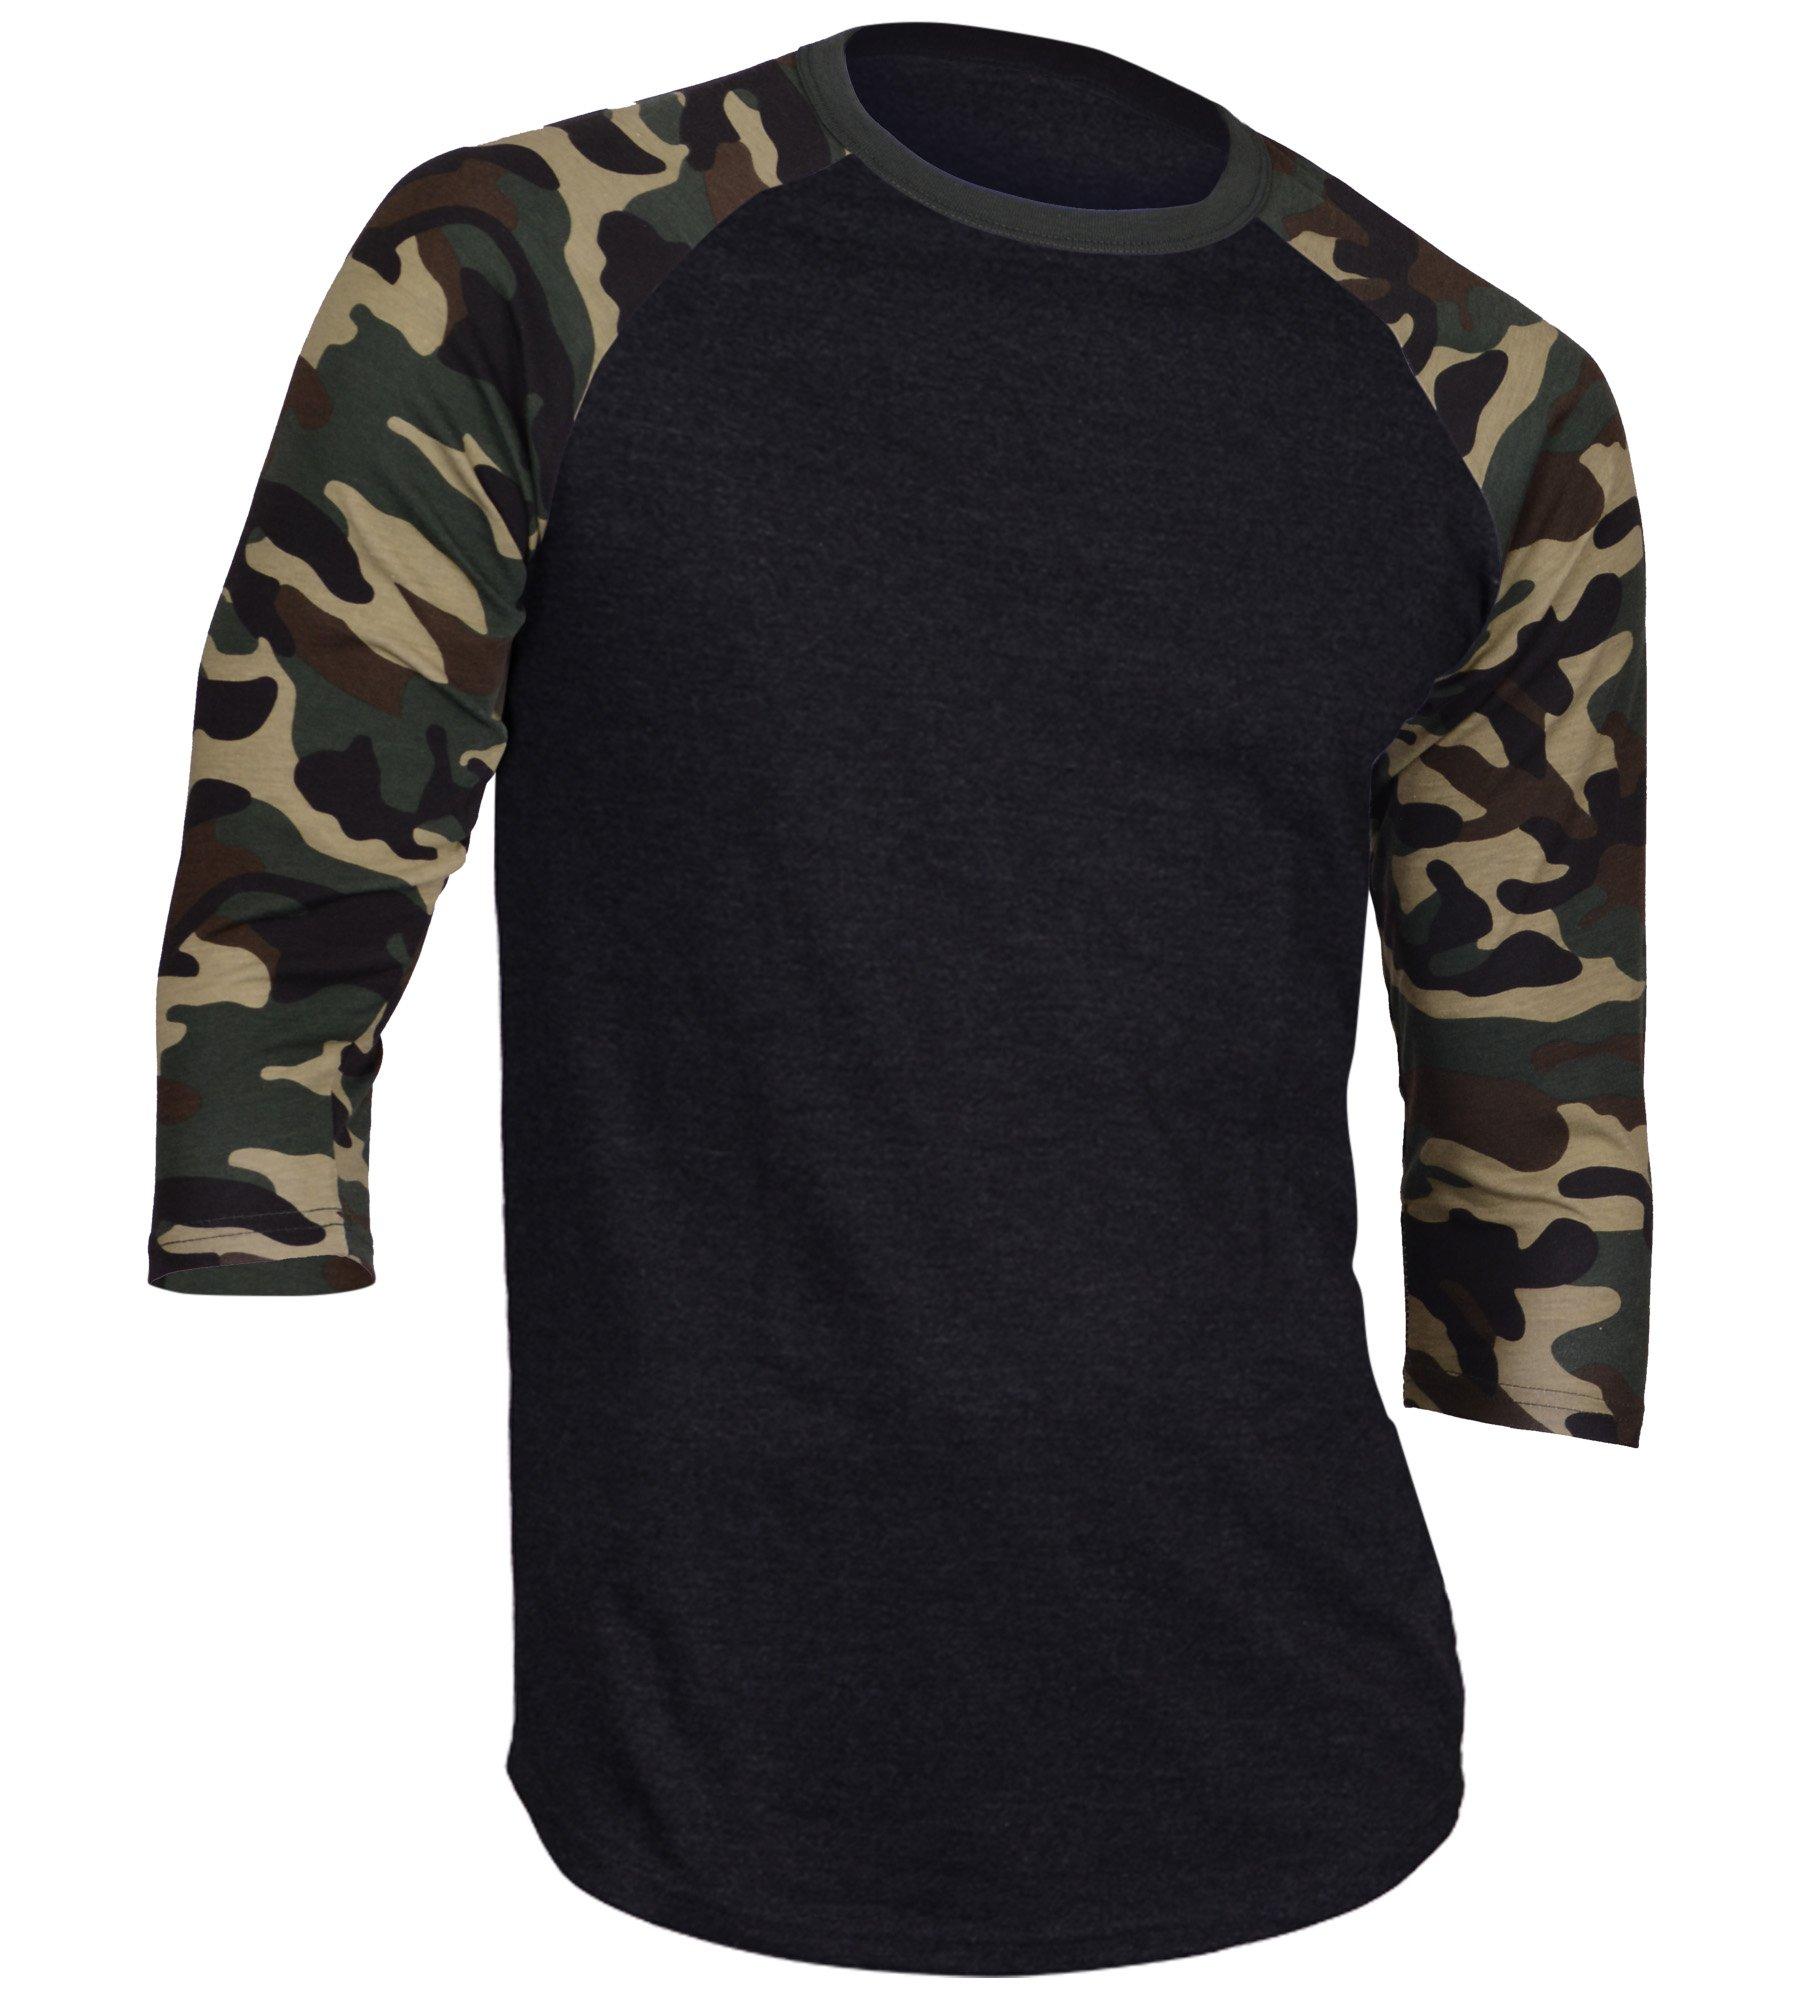 Dream USA Men's Casual 3/4 Sleeve Baseball Tshirt Raglan Jersey Shirt Black/Dk Camo 3XL